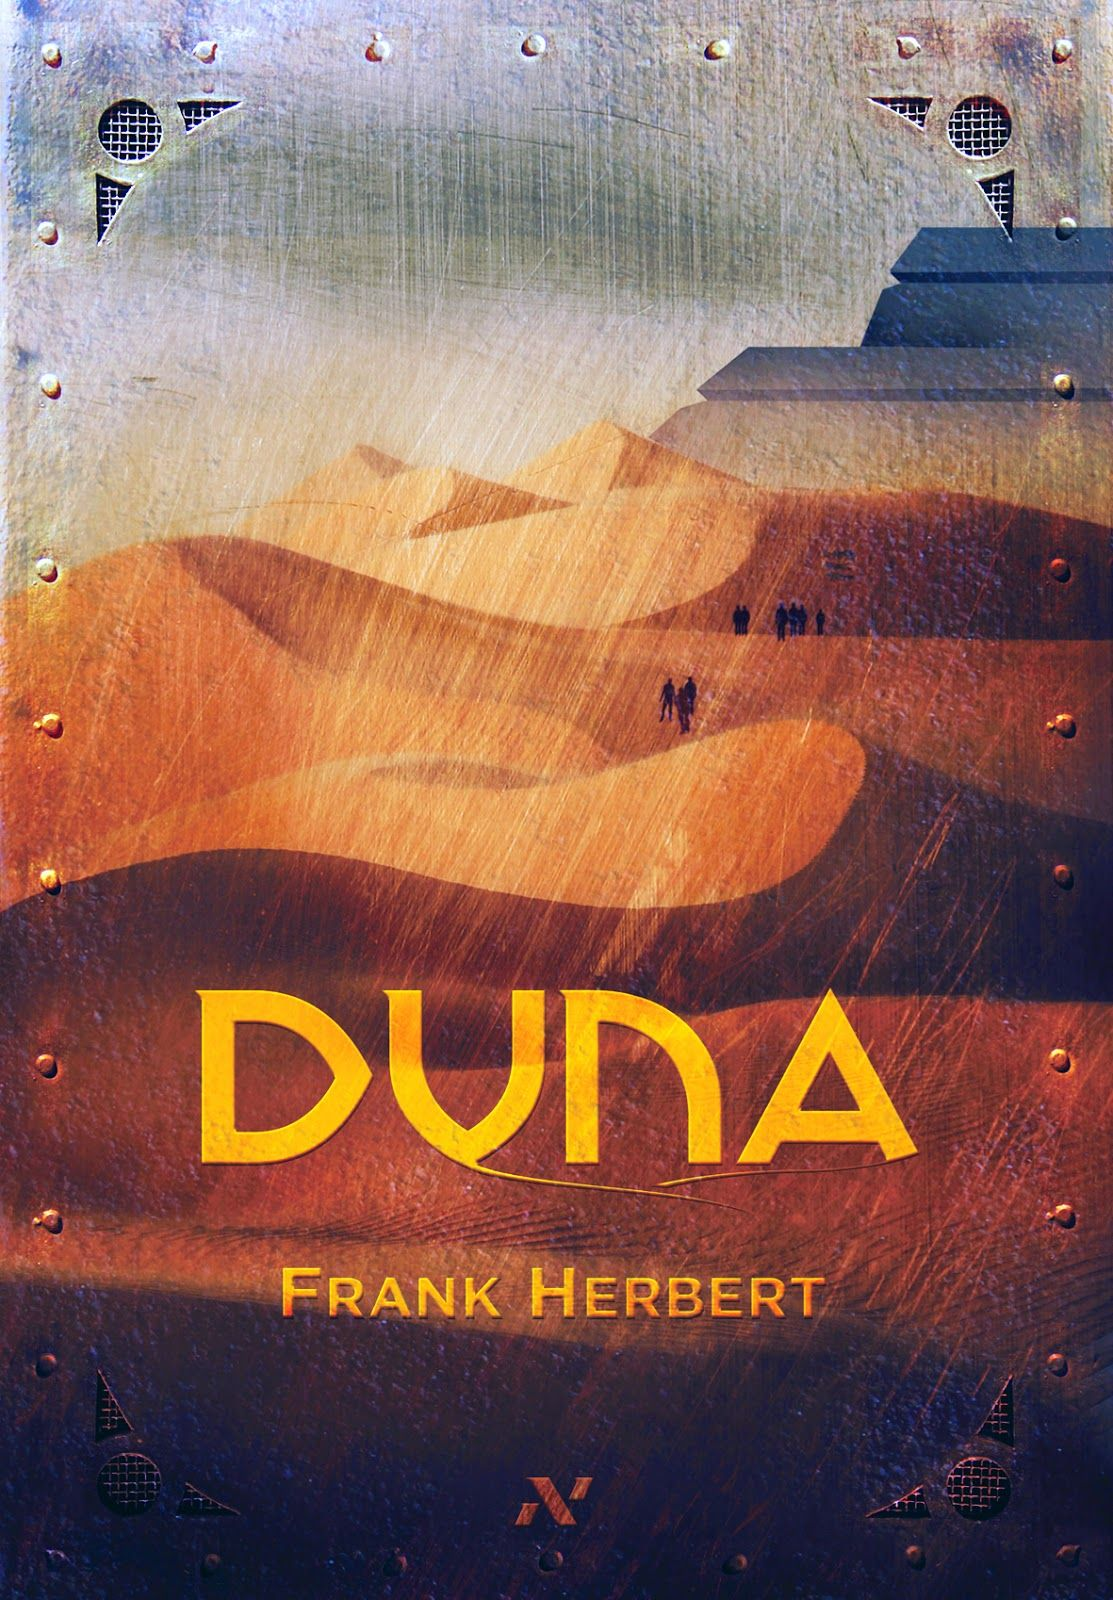 Marcianos Como No Cinema: Frank Herbert — DUNA, Saga para download